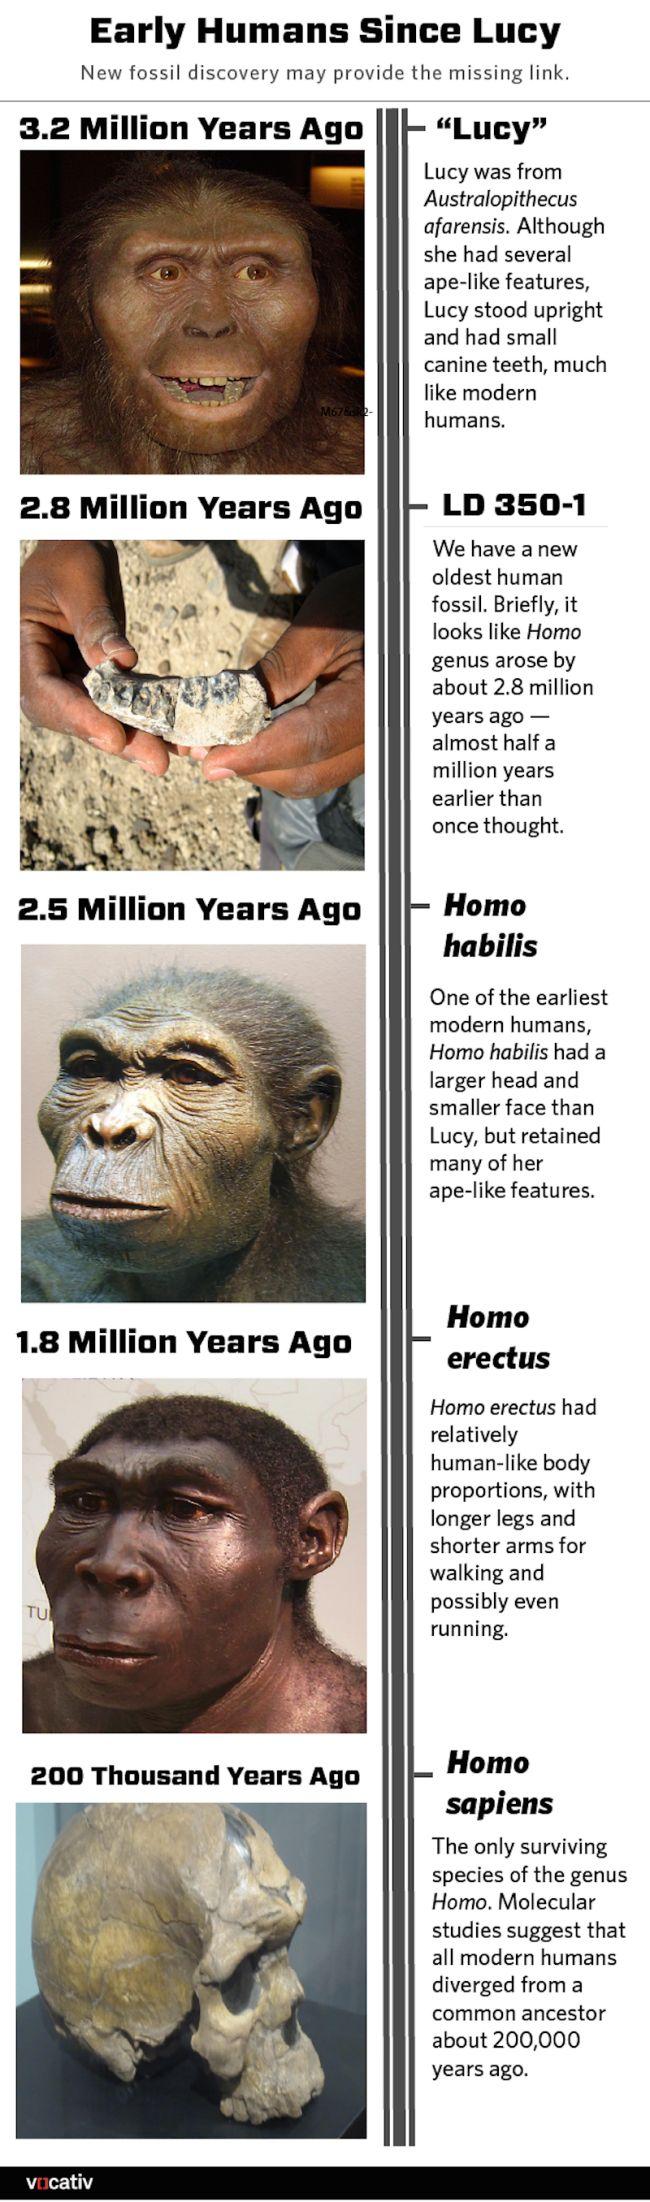 last_final_human_fossil_timeline 02